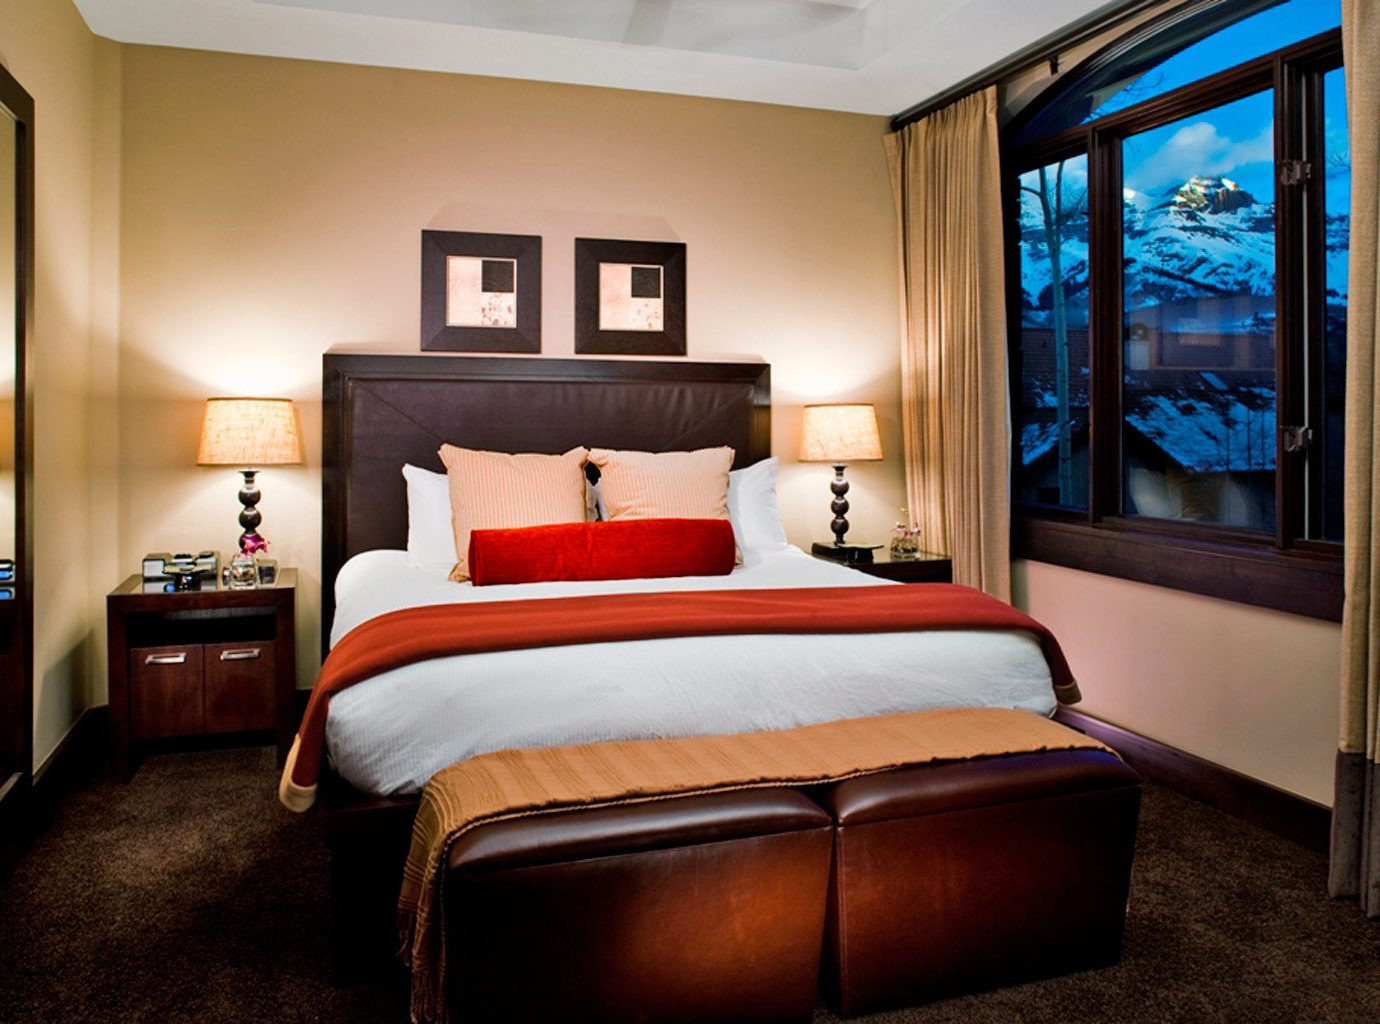 Bedroom Classic Elegant Scenic views sofa property Suite home cottage